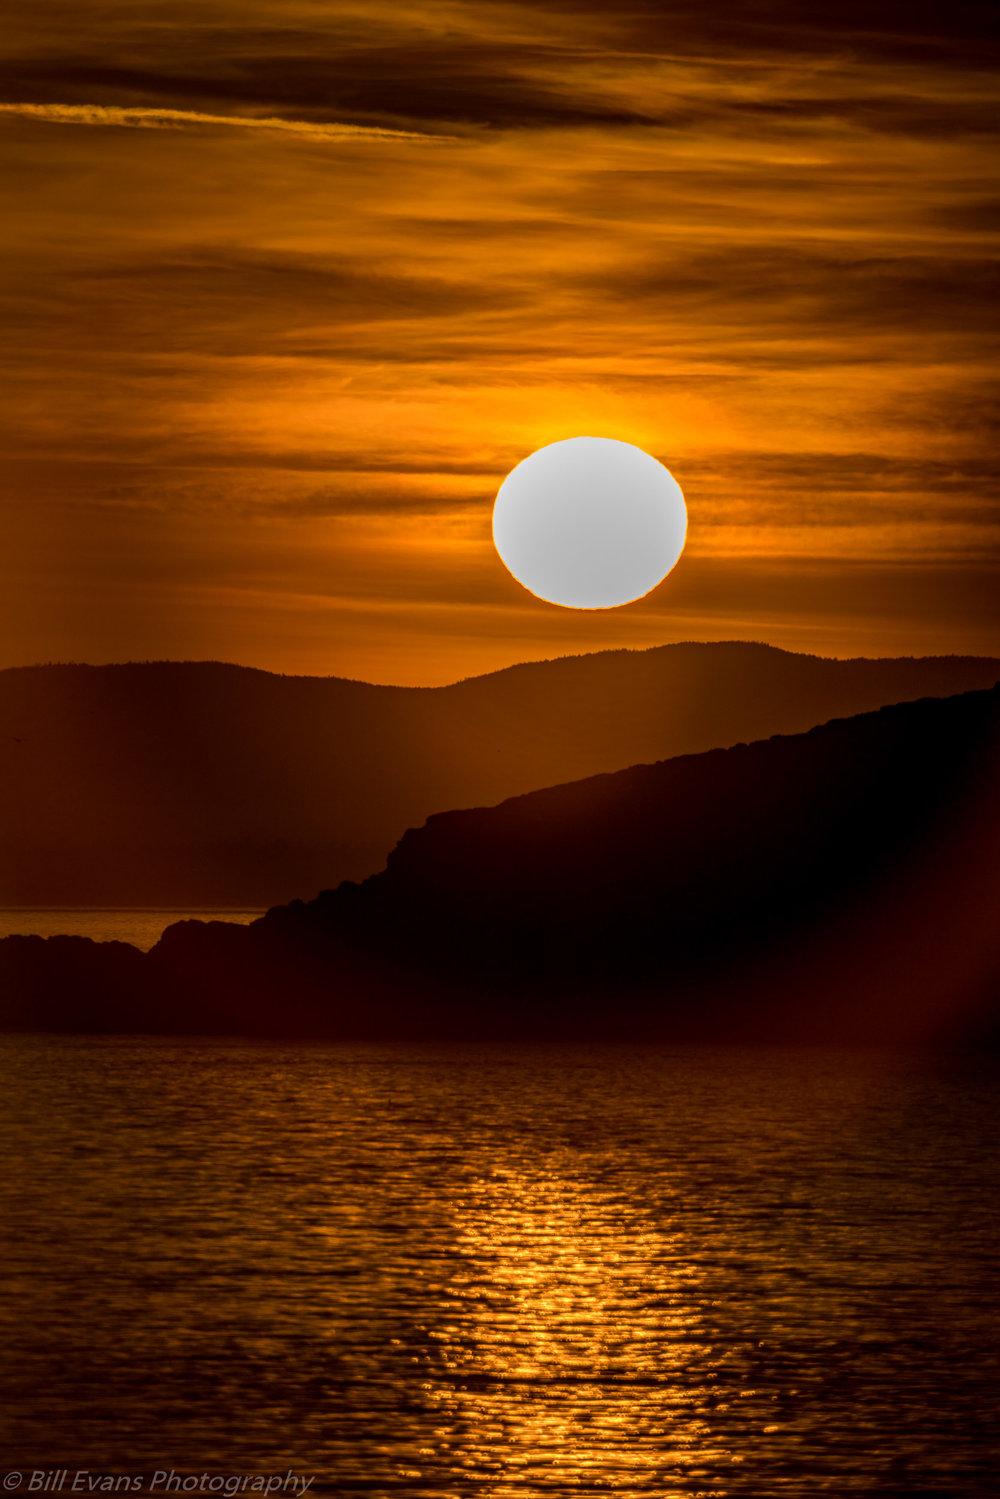 Image No. 8 - Sunset from Grandmas Cove (San Juan Island, WA)   Sony A7Rii + Sony 500mm Reflex (1/8000s @ f/8 iso 100)